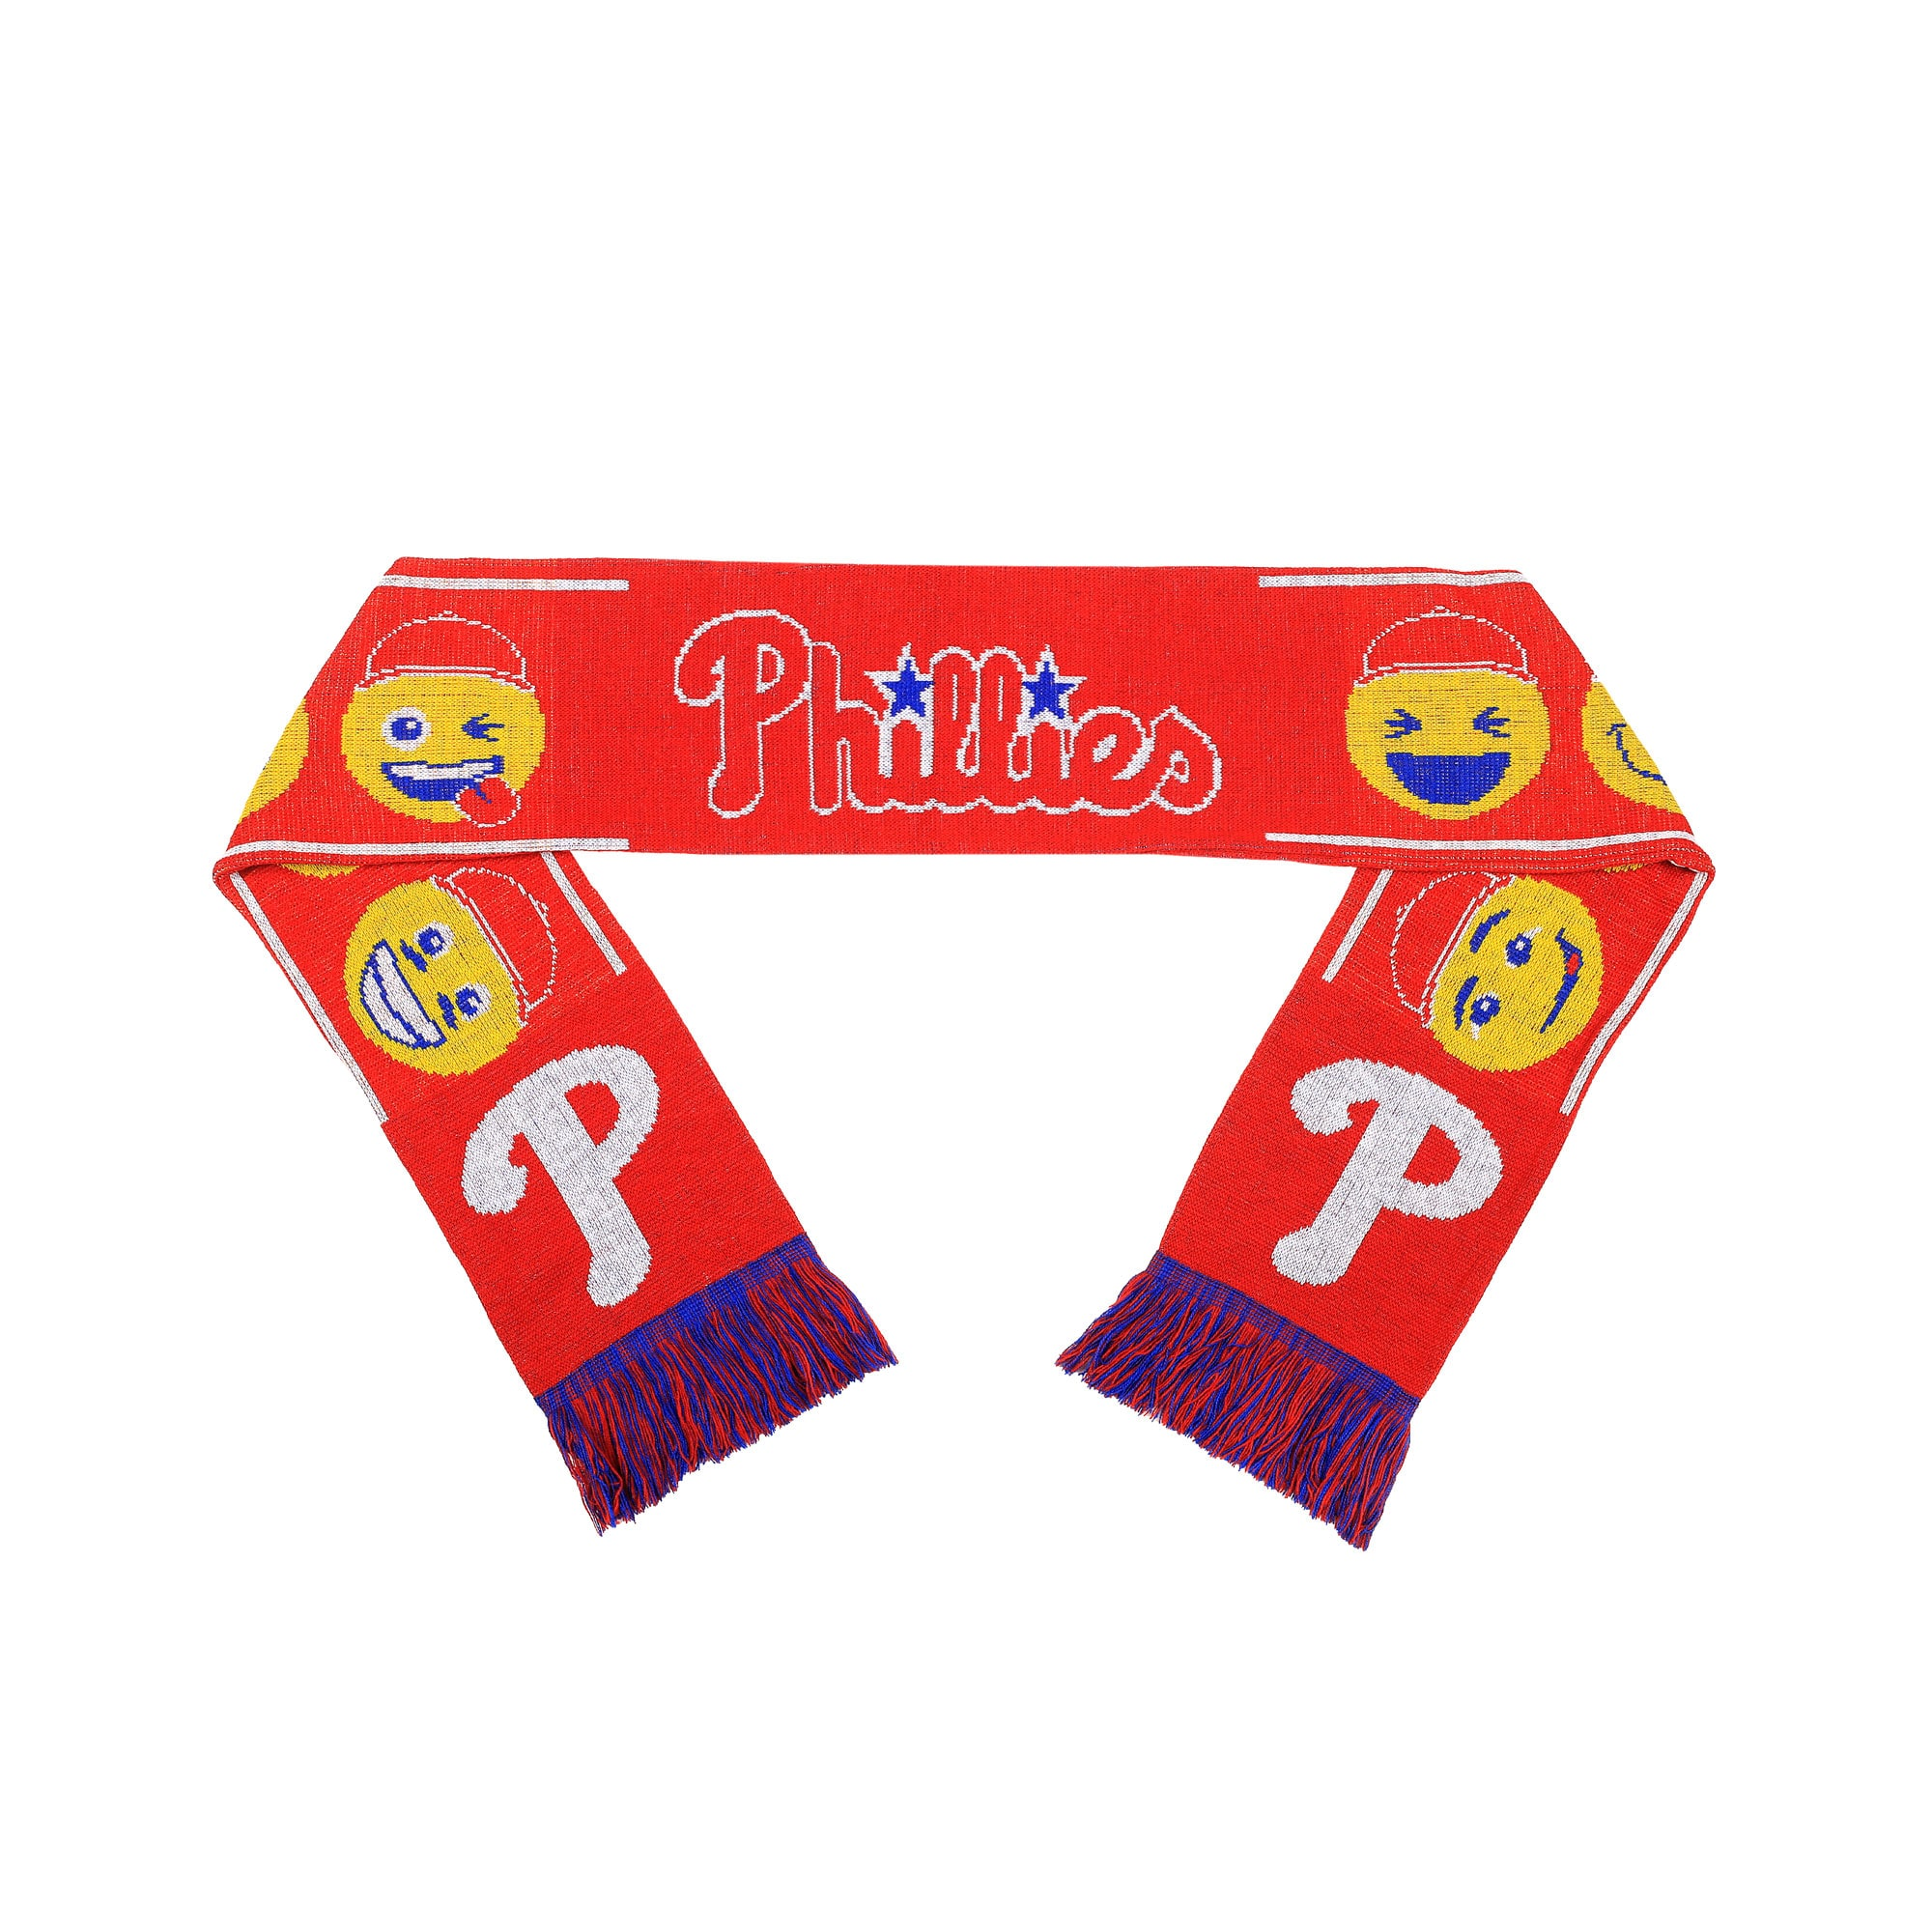 Philadelphia Phillies Teamoji Acrylic Scarf